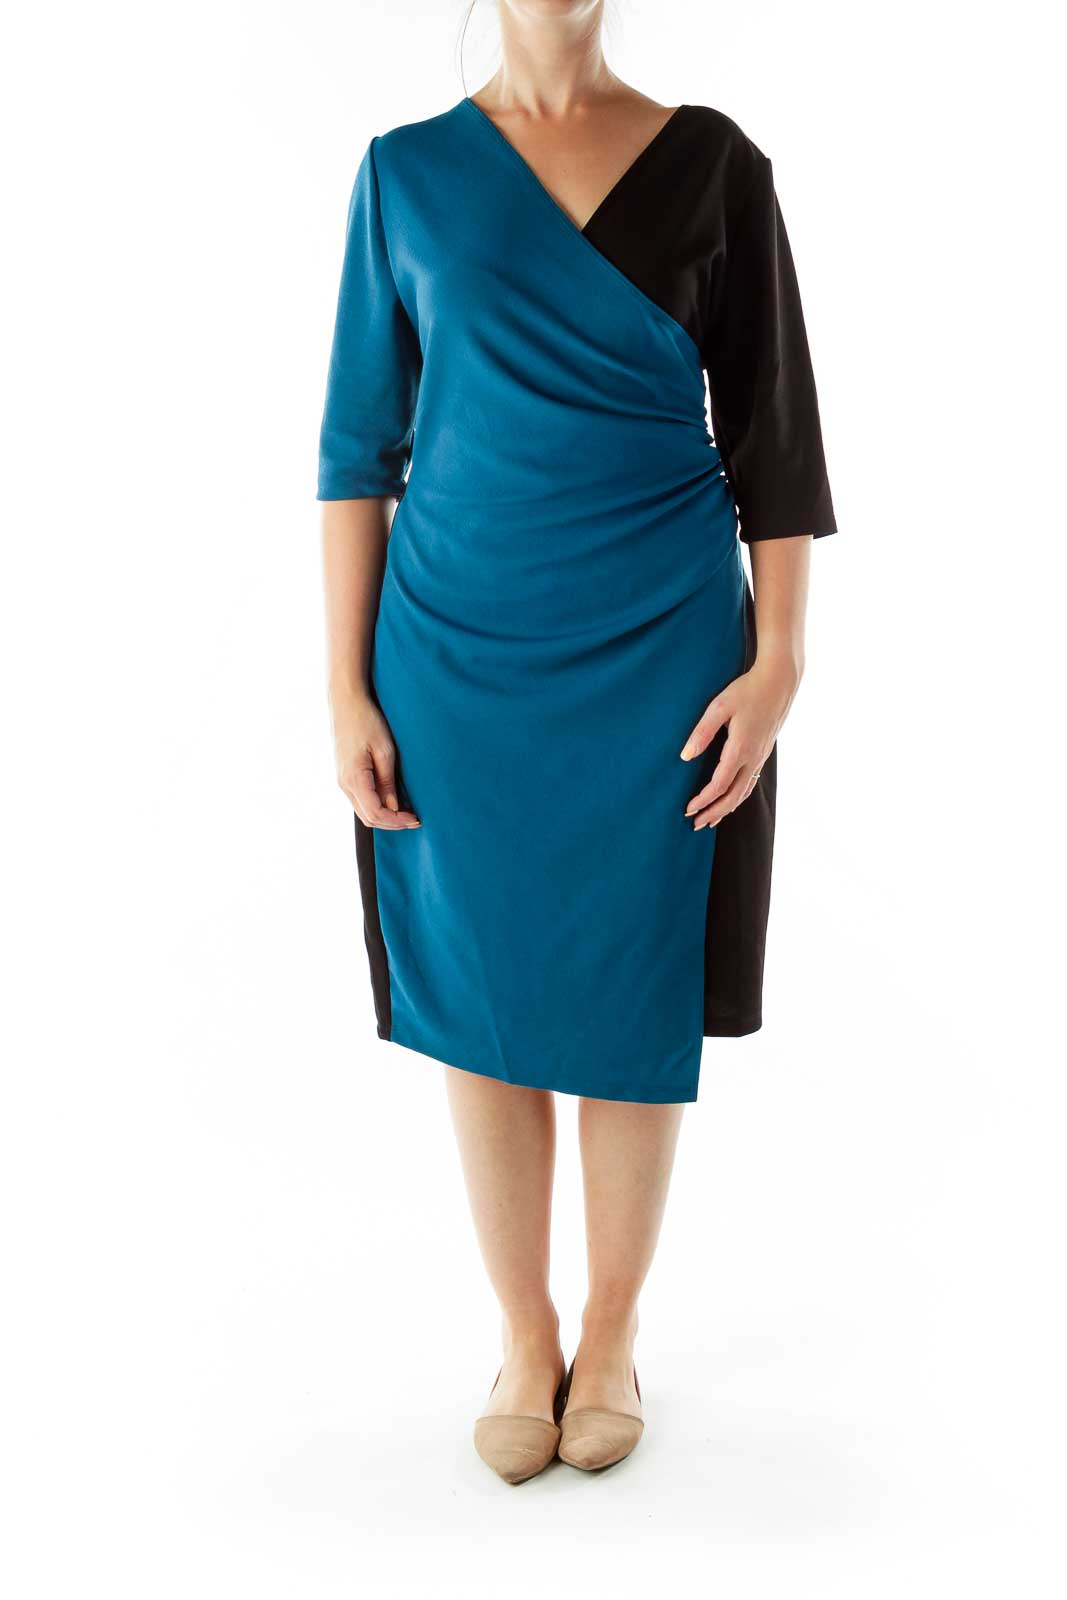 Black Blue Scrunched Wrap Work Dress